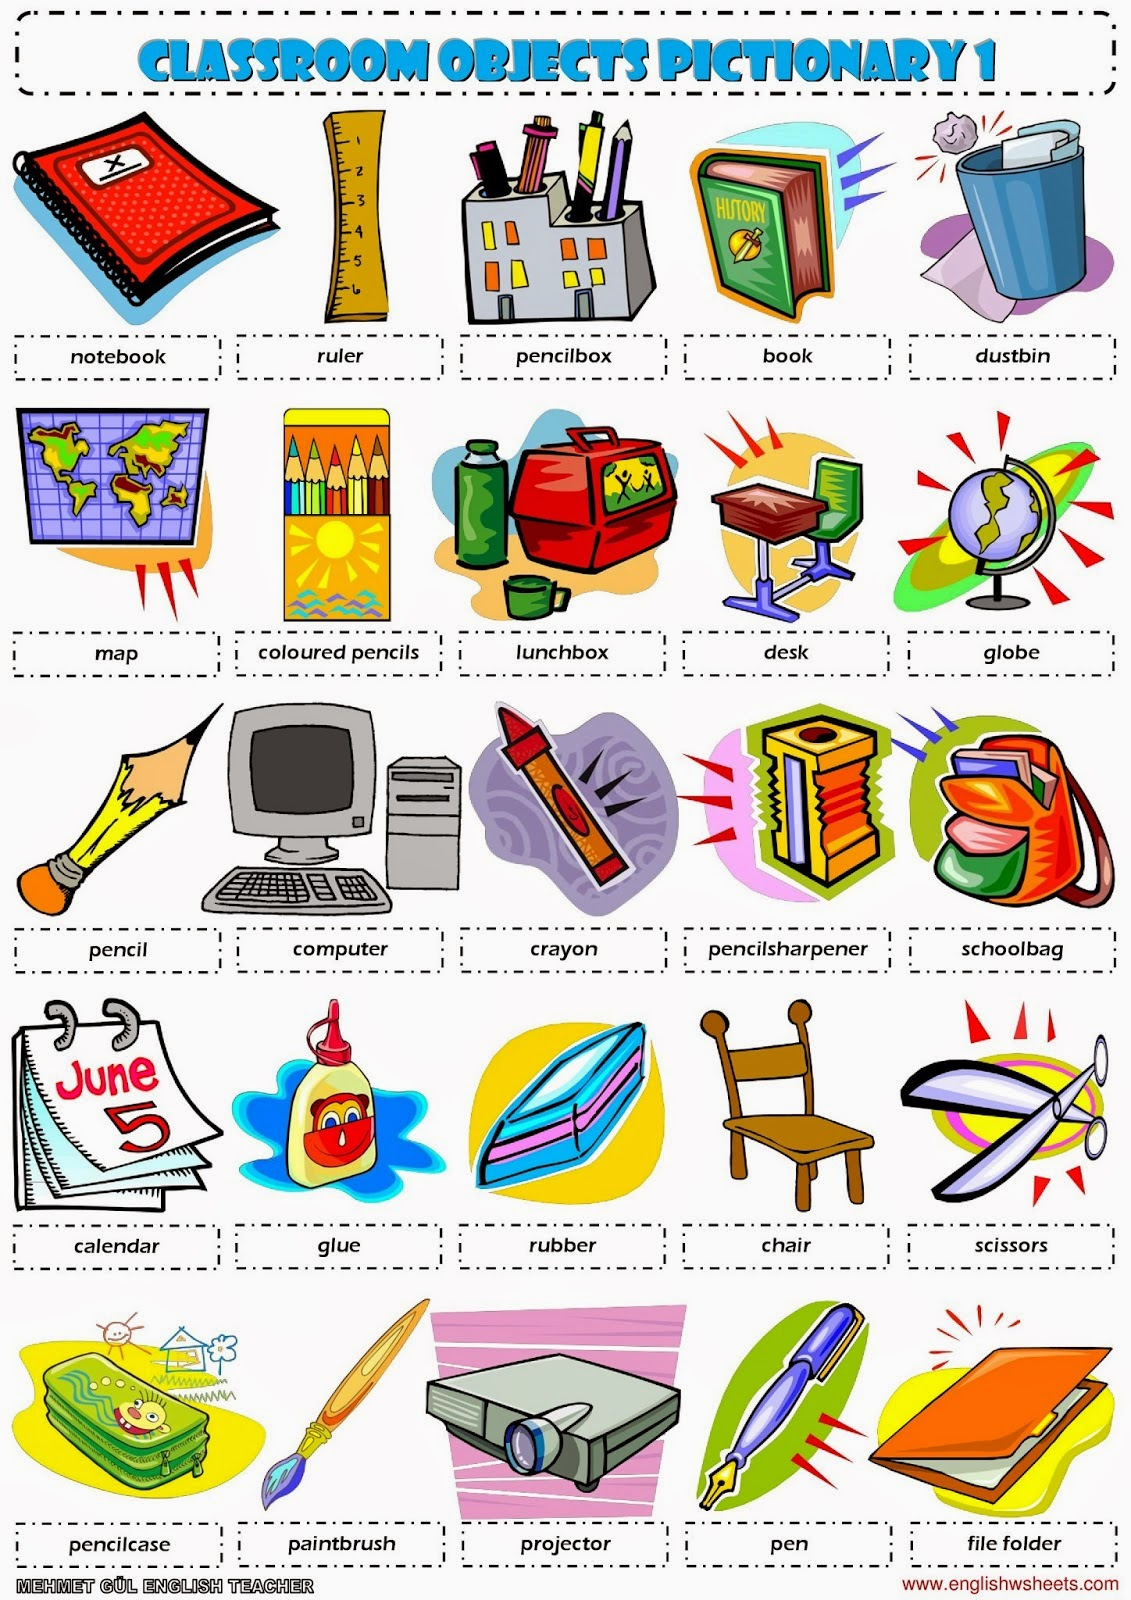 dictionary of classroom strategies k-6